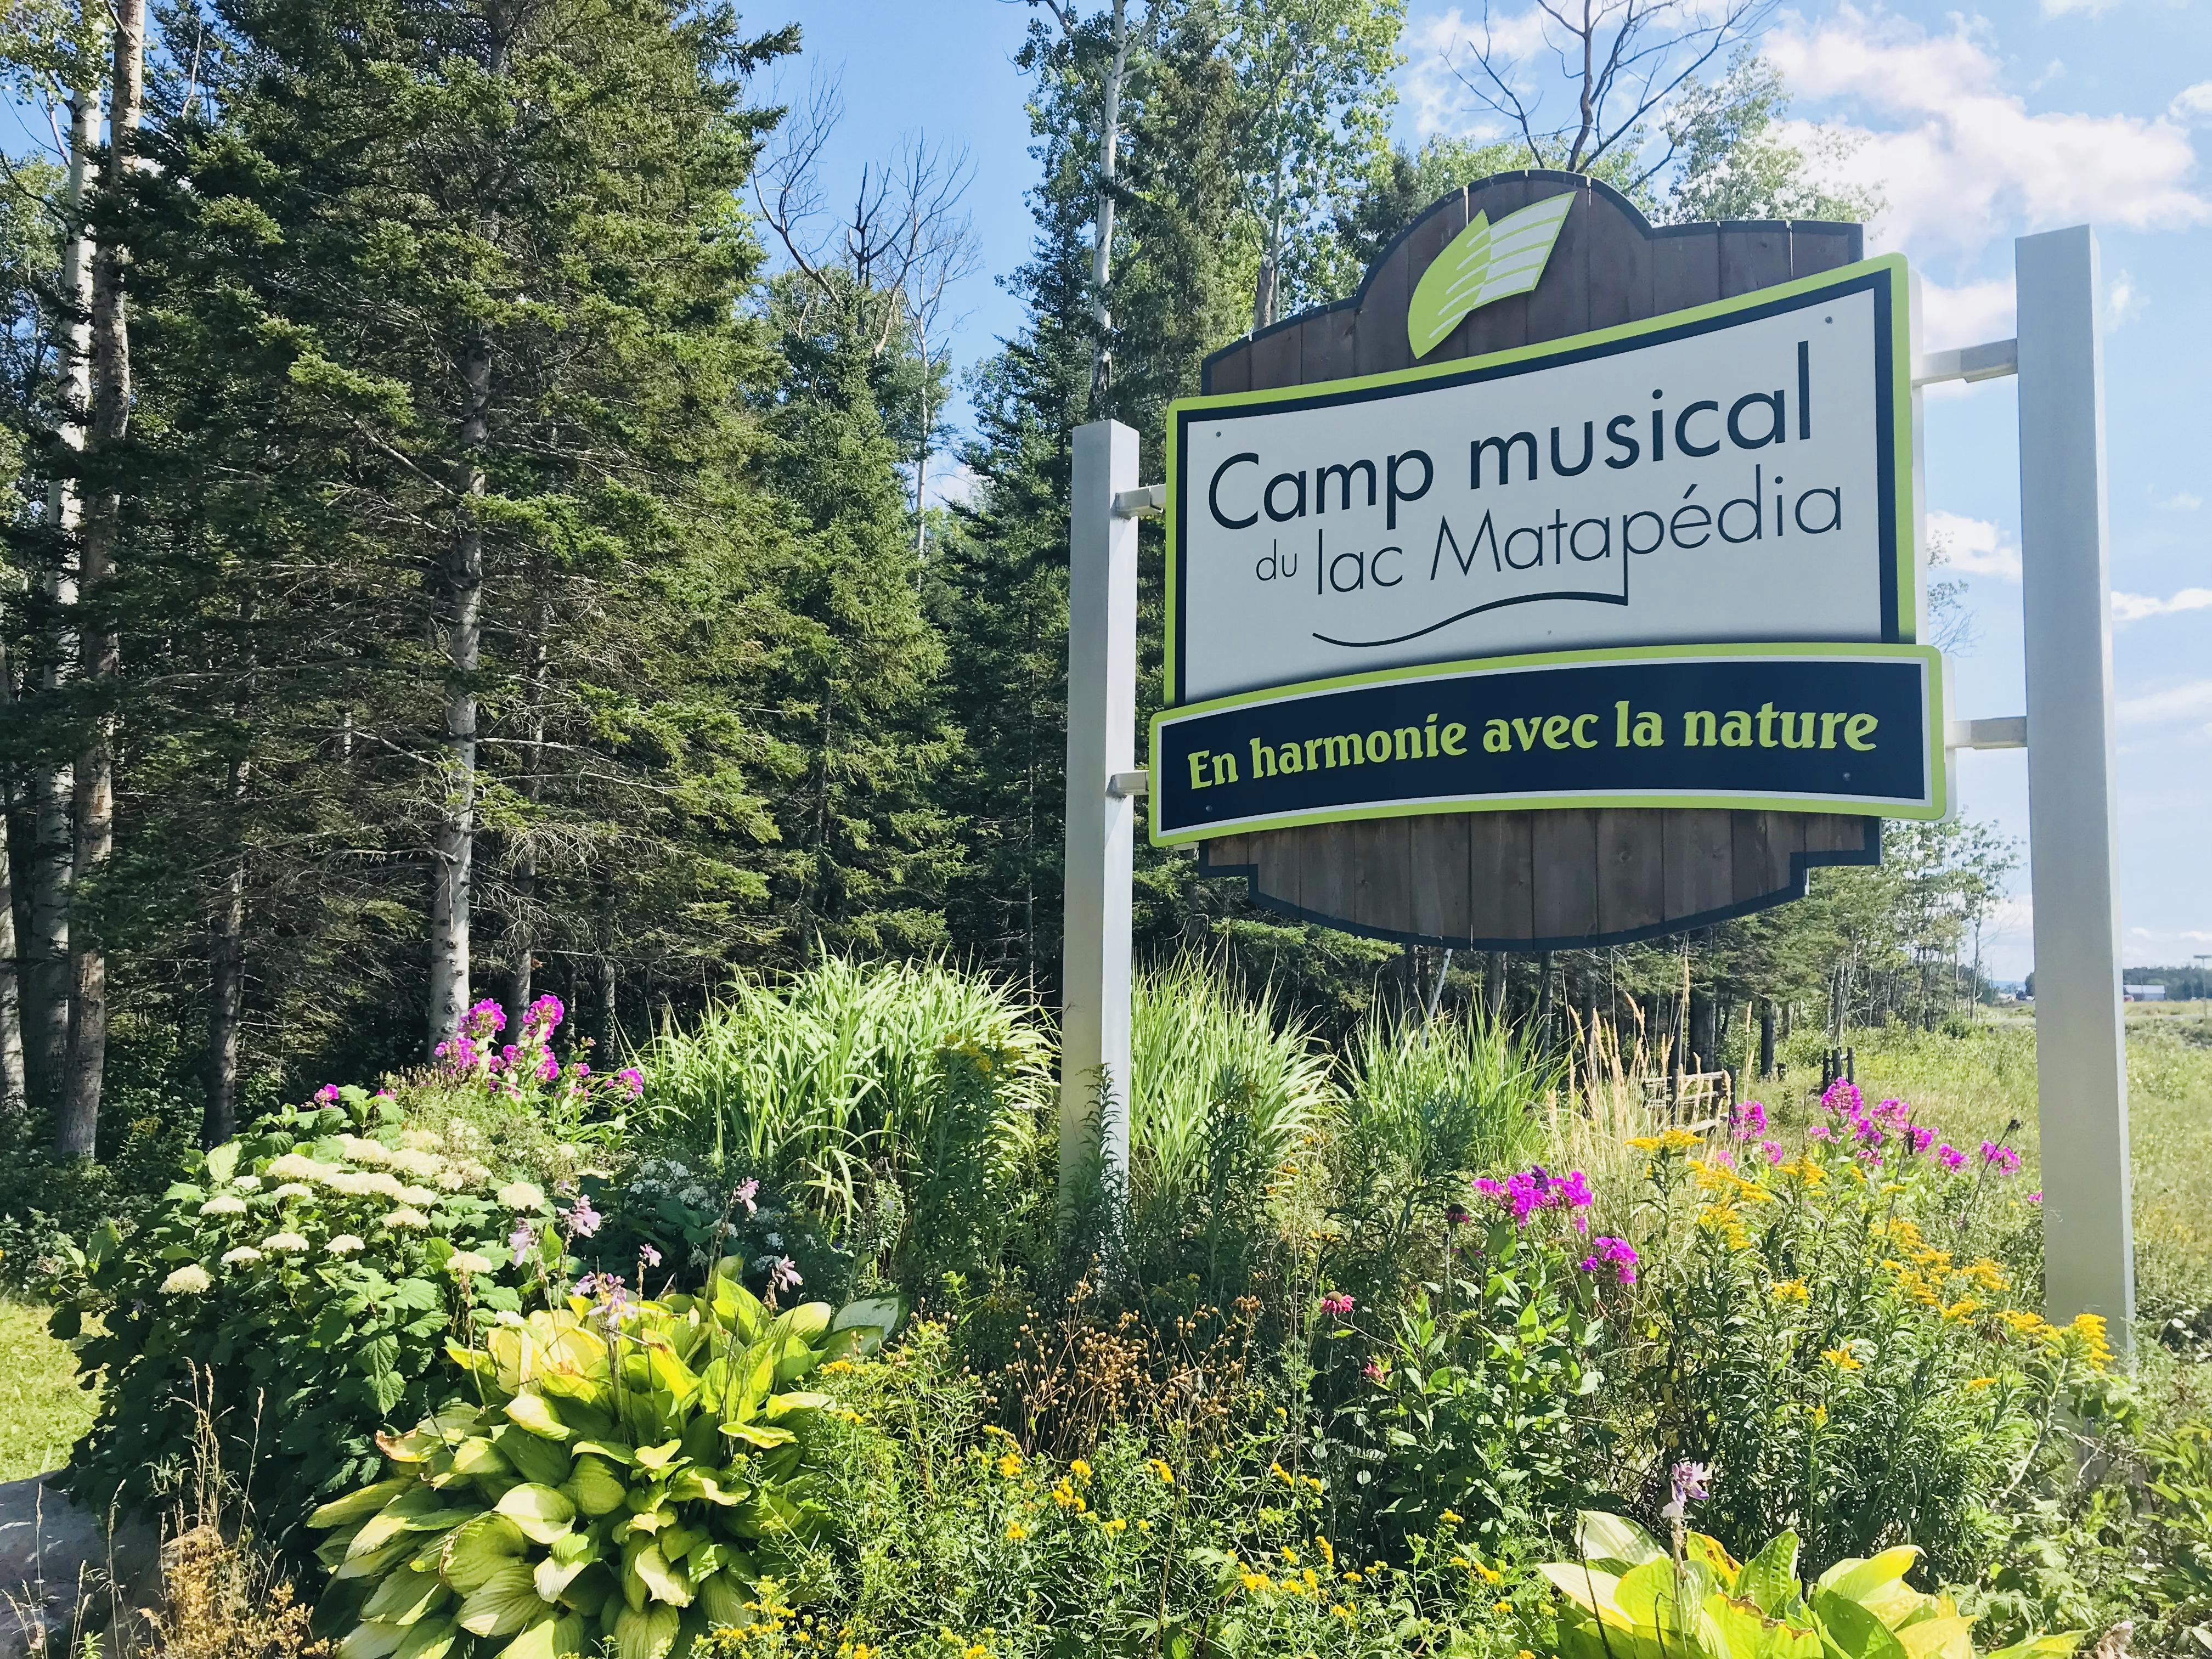 camp musical